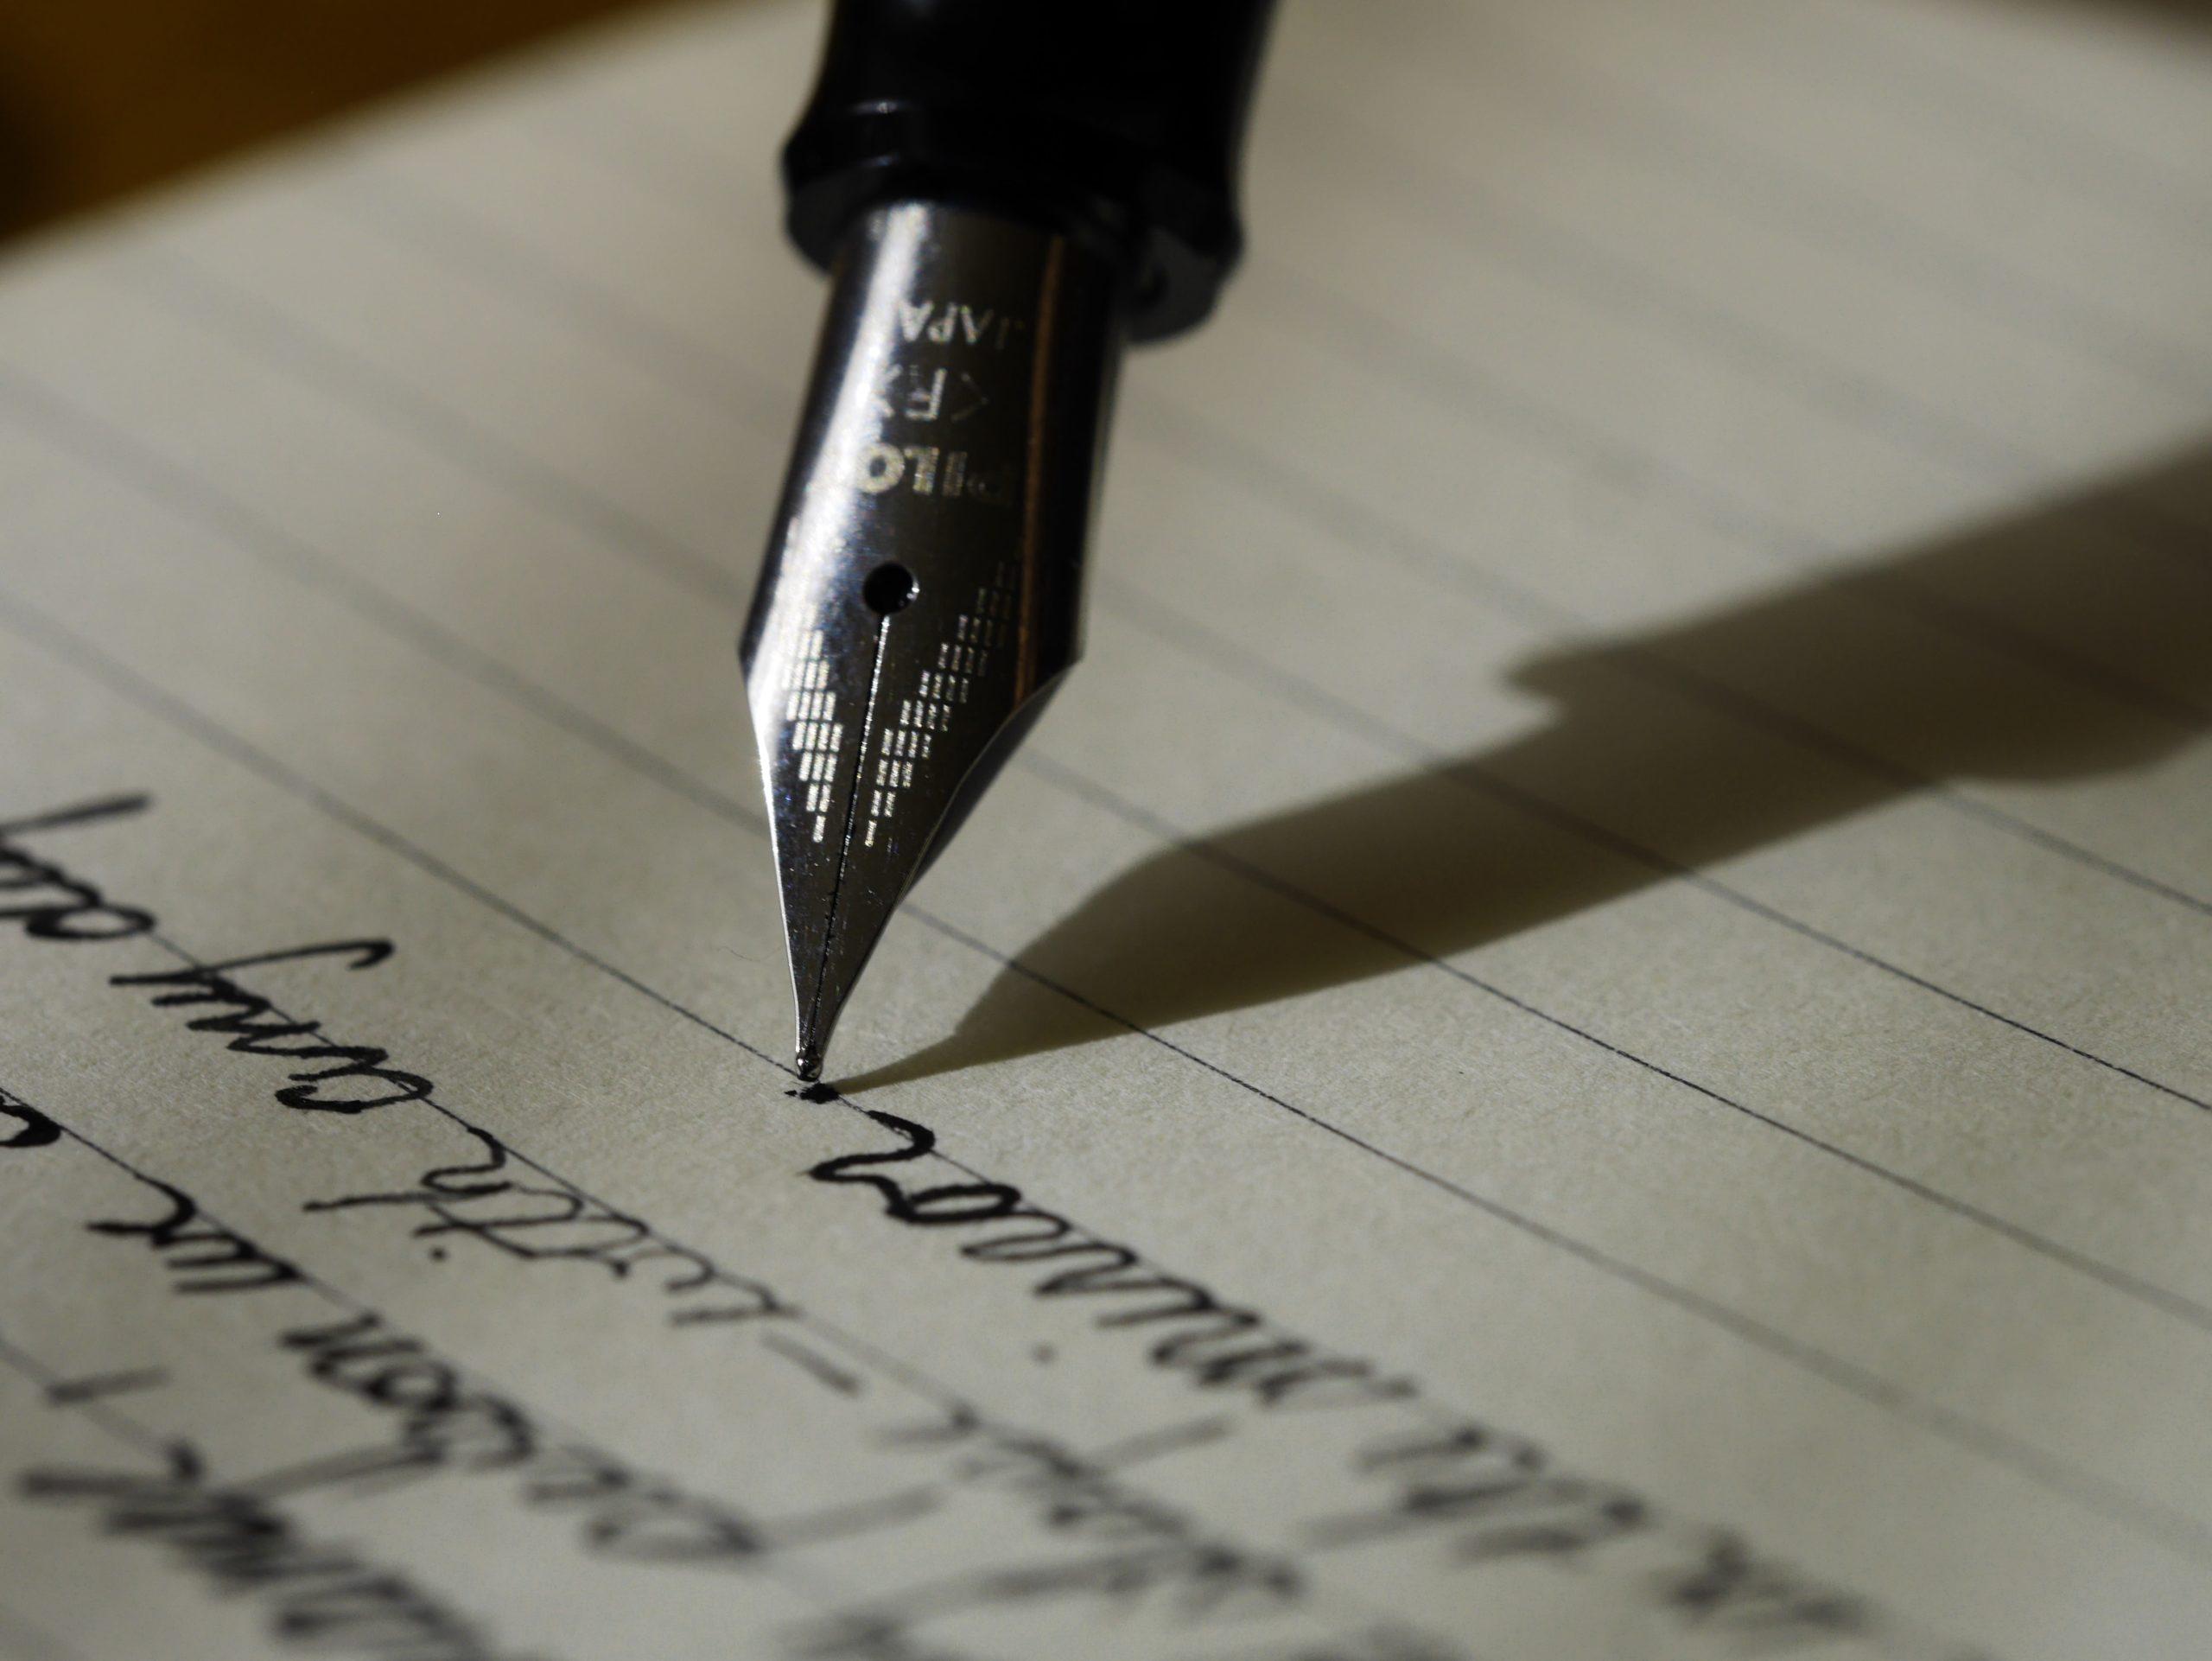 écriture stylo plume